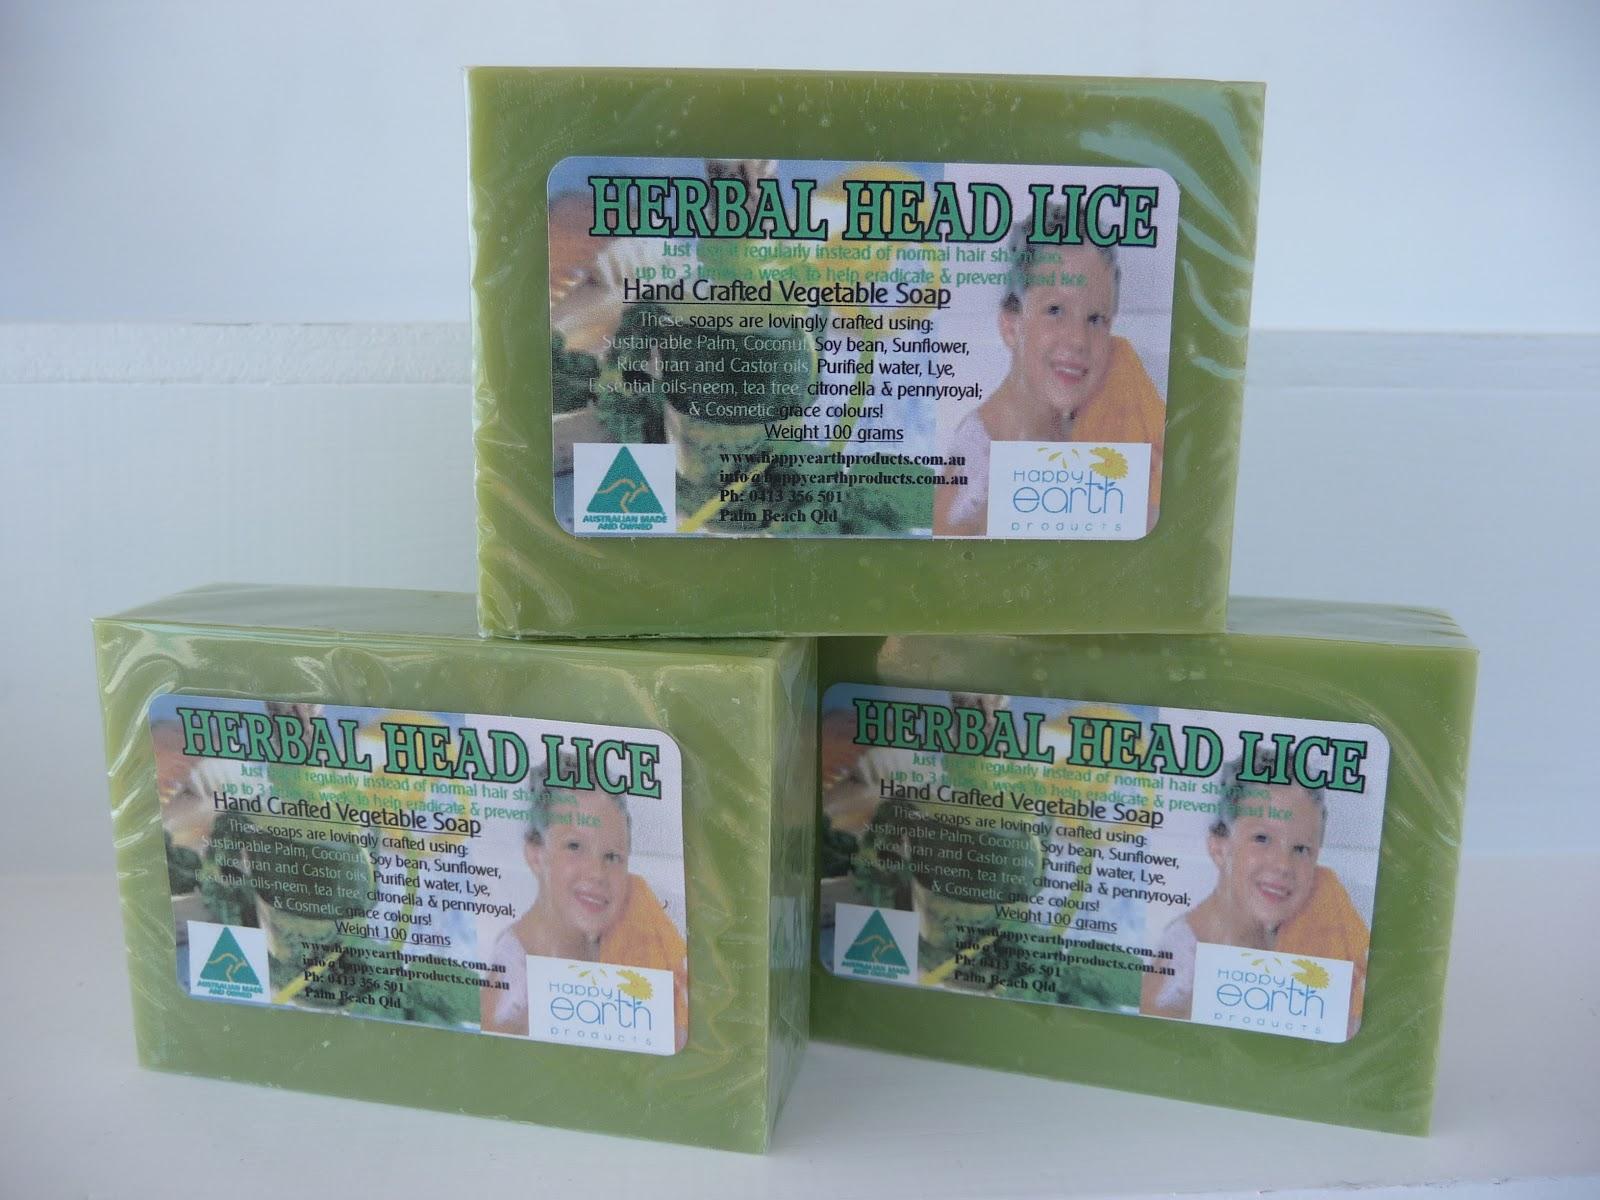 Herbal Head Lice Soap